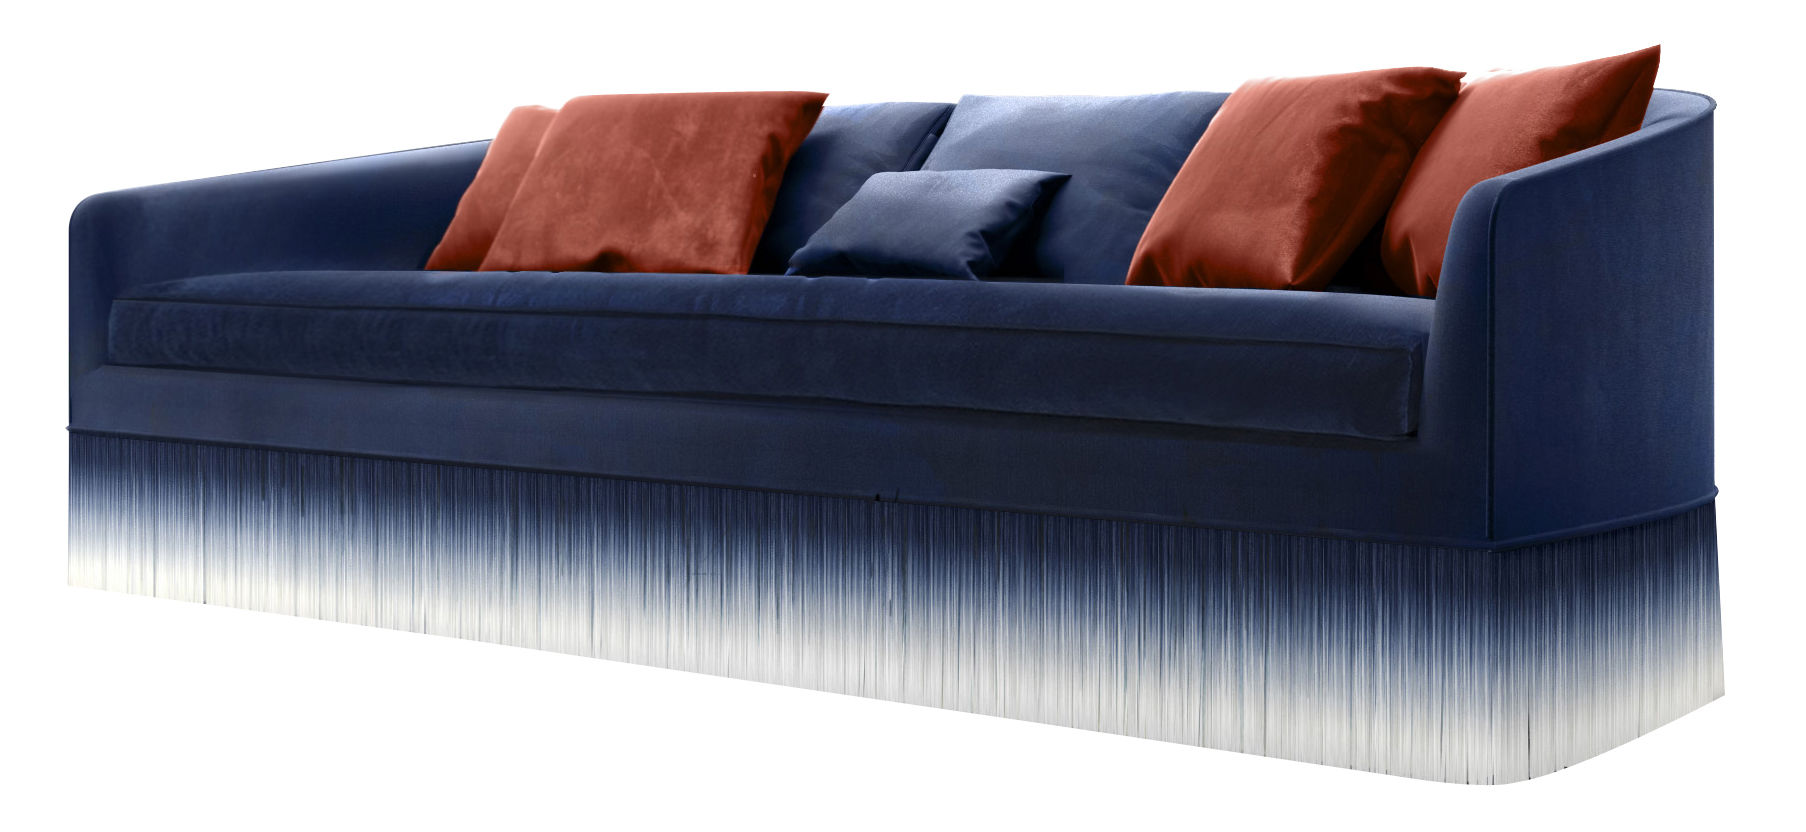 amami 3 sitzer l 250 cm velours fransen moooi sofa. Black Bedroom Furniture Sets. Home Design Ideas